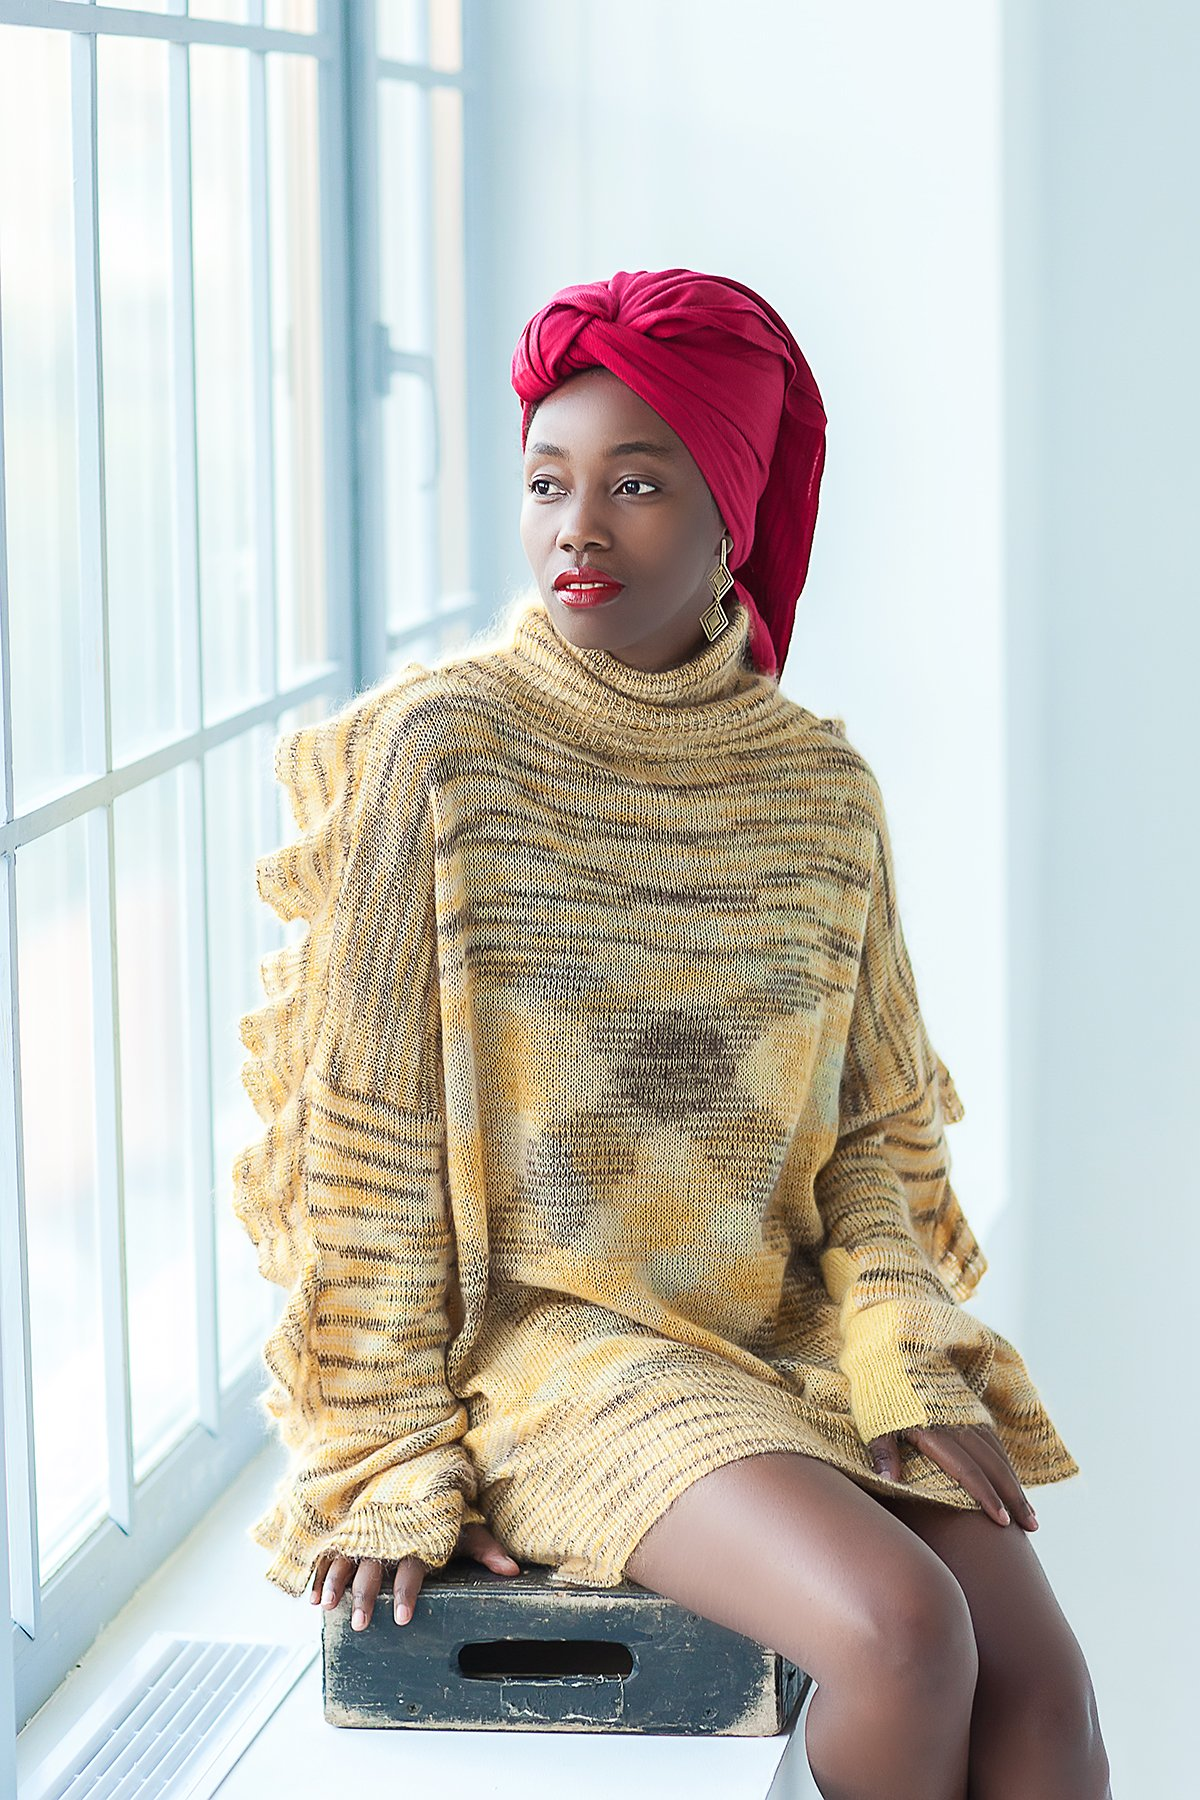 Knit designer sweater for women Oversized womens knitwear Long sleeved knitted pullover Merino wool sweater Yellow knitwear